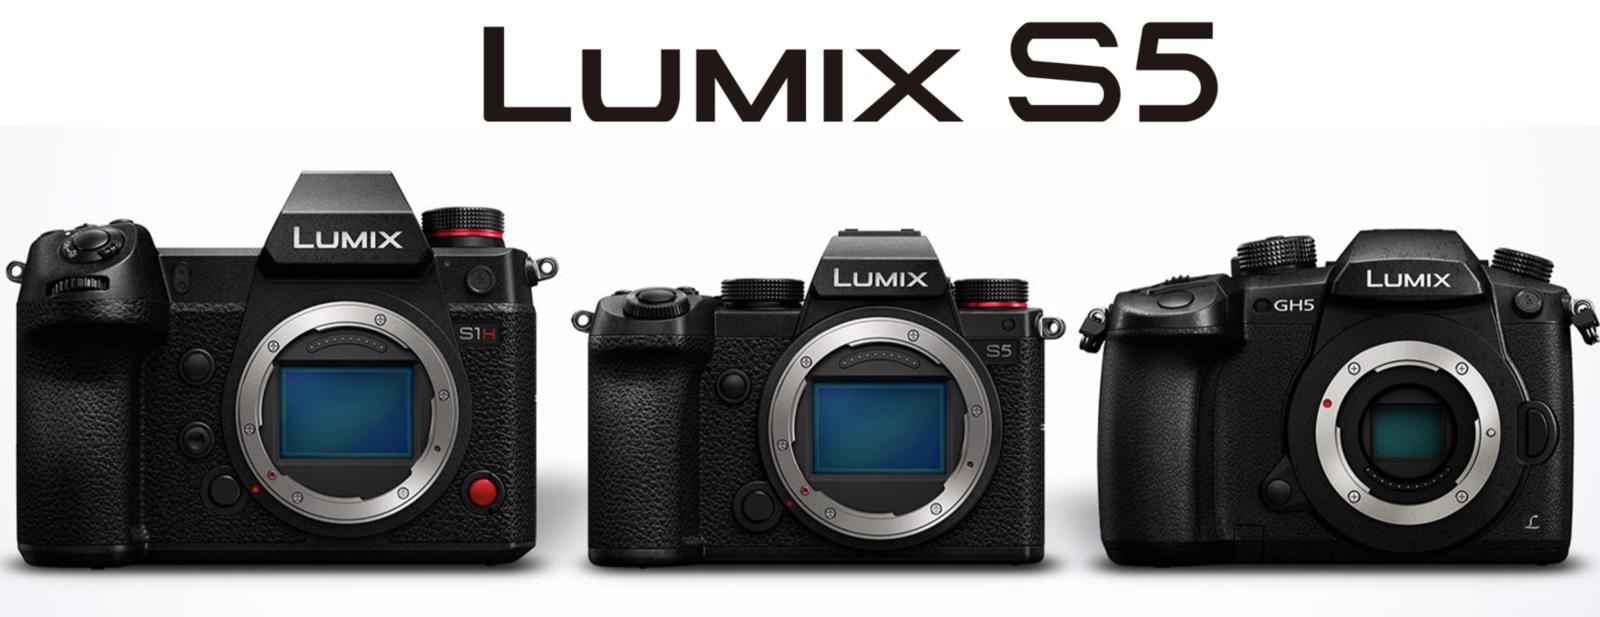 Test du Panasonic Lumix S5 : un GH5 Full Frame ou mini S1H ? (+ VIDEO)